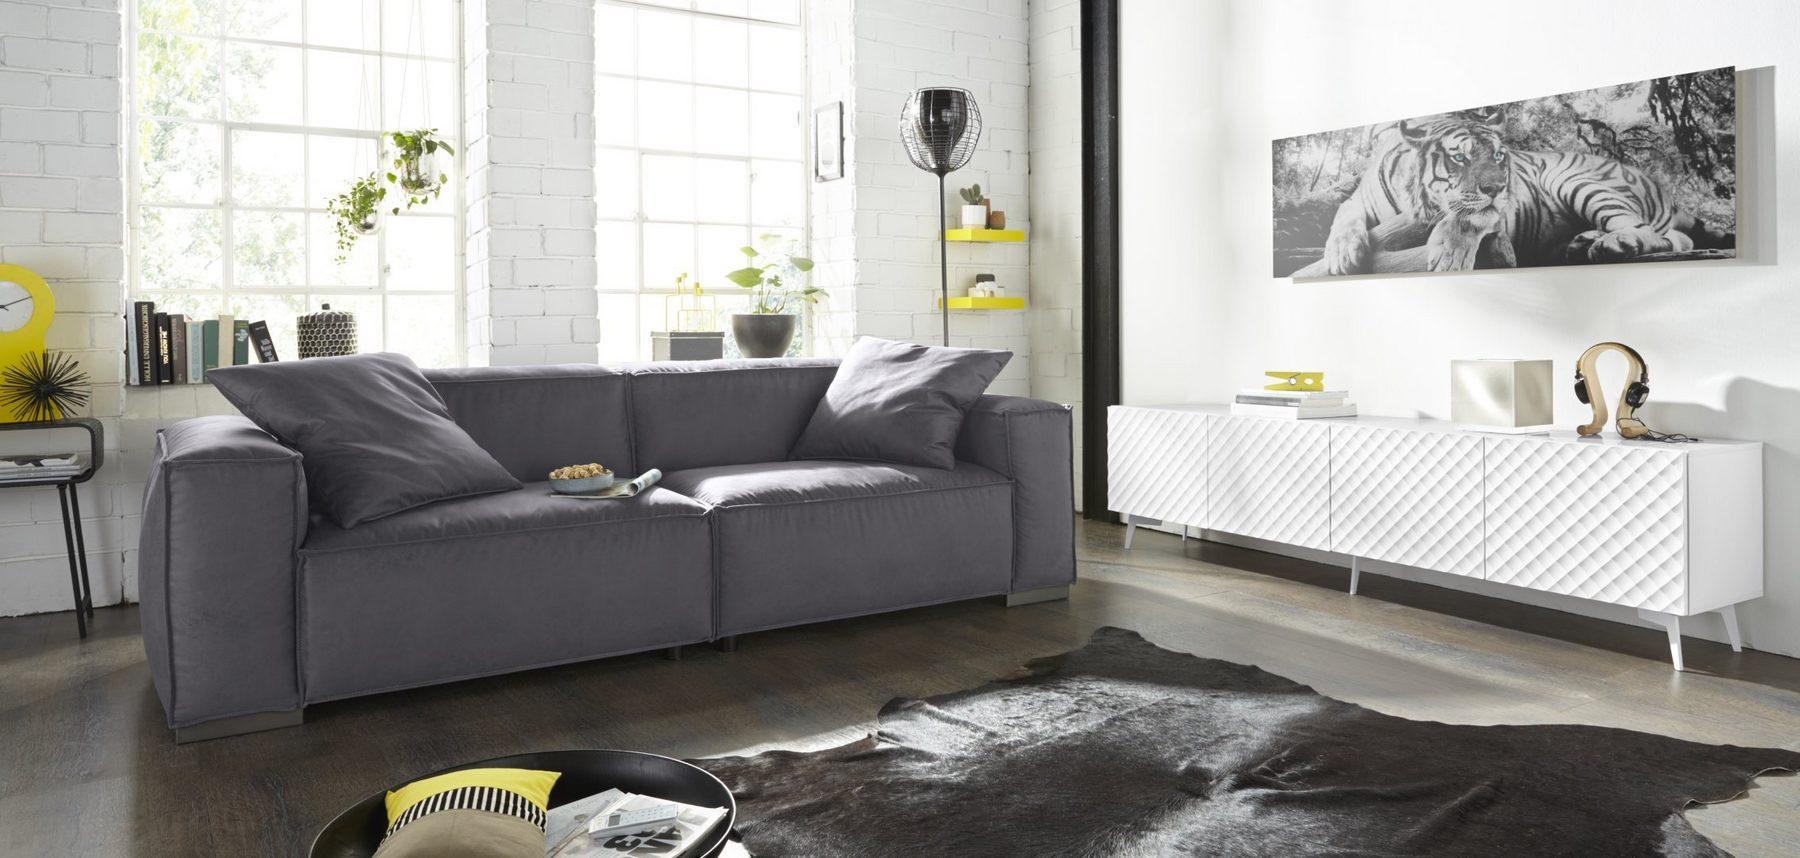 design m bel online kaufen modern stilvoll otto. Black Bedroom Furniture Sets. Home Design Ideas